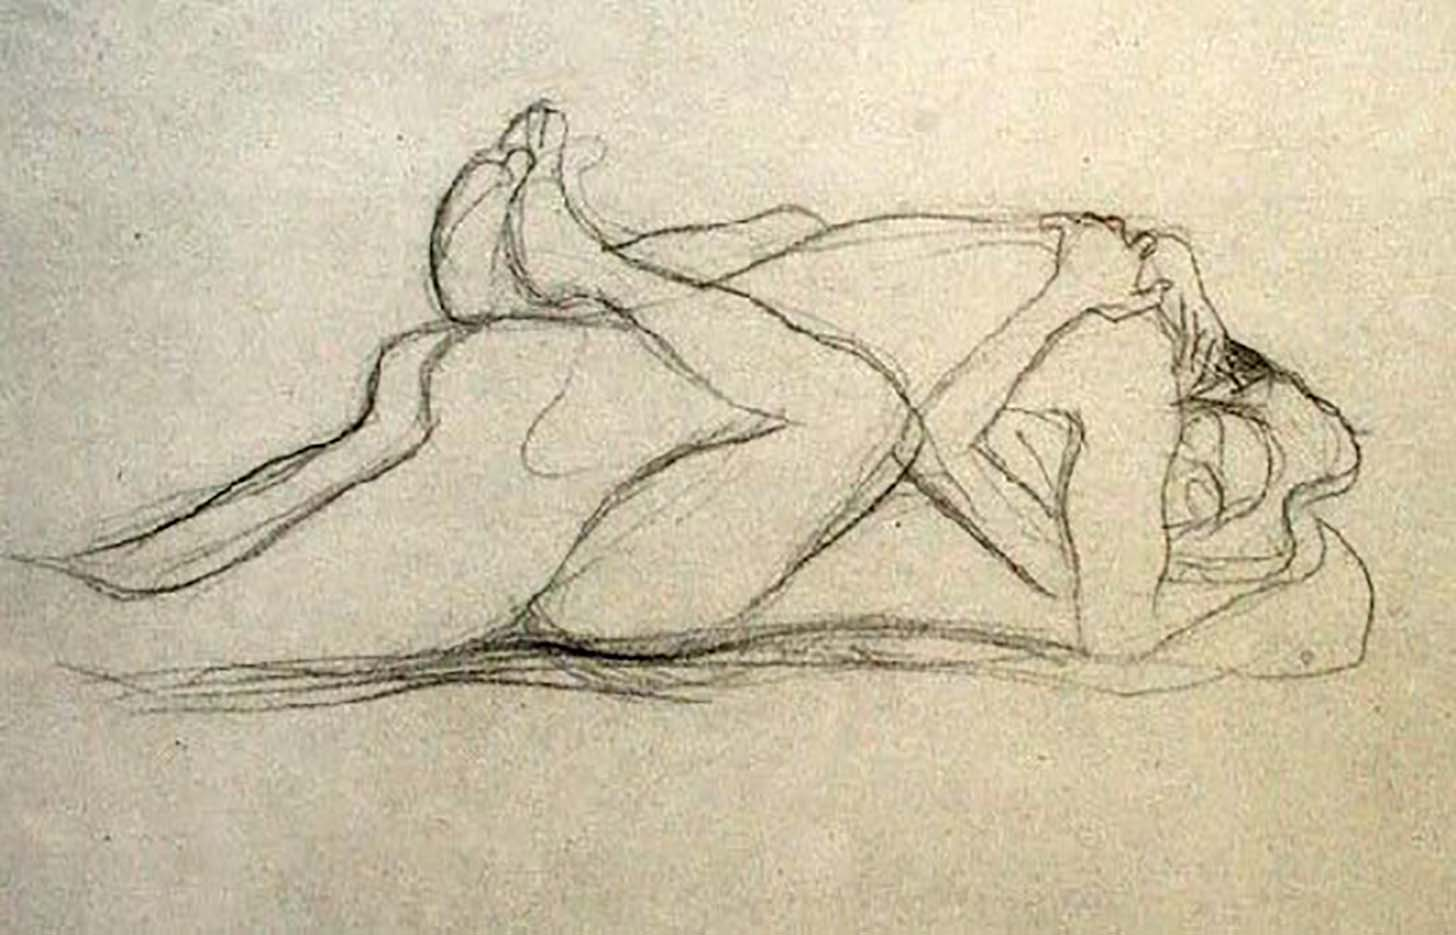 Густав Климт (Gustav Klimt) эскиз, Recumbent Lovers